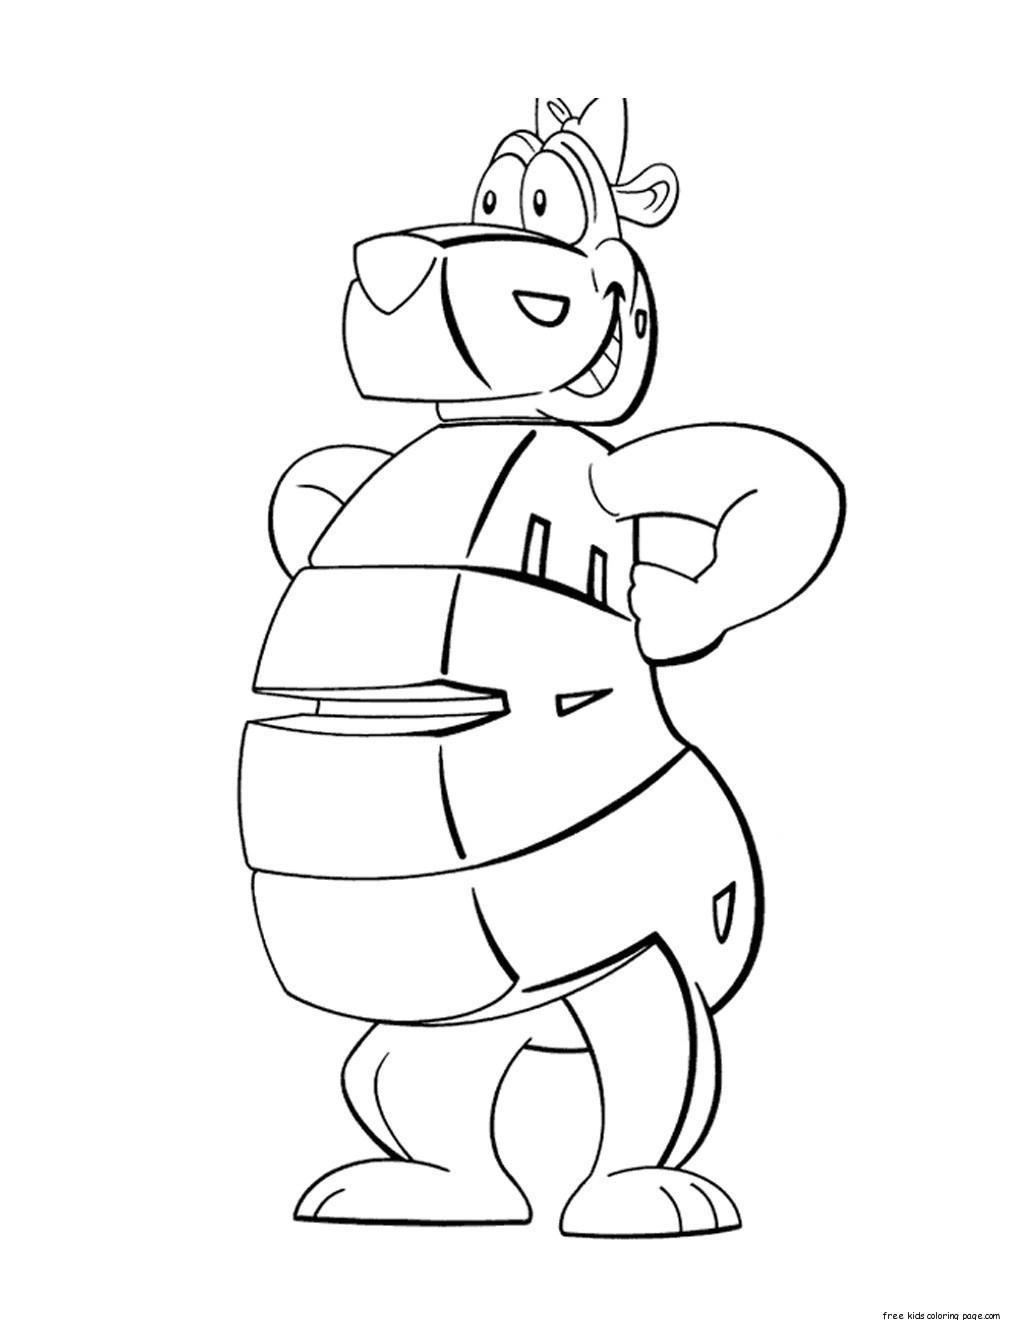 Print Out Alphabet Animal Worksheets For PreschoolersFree